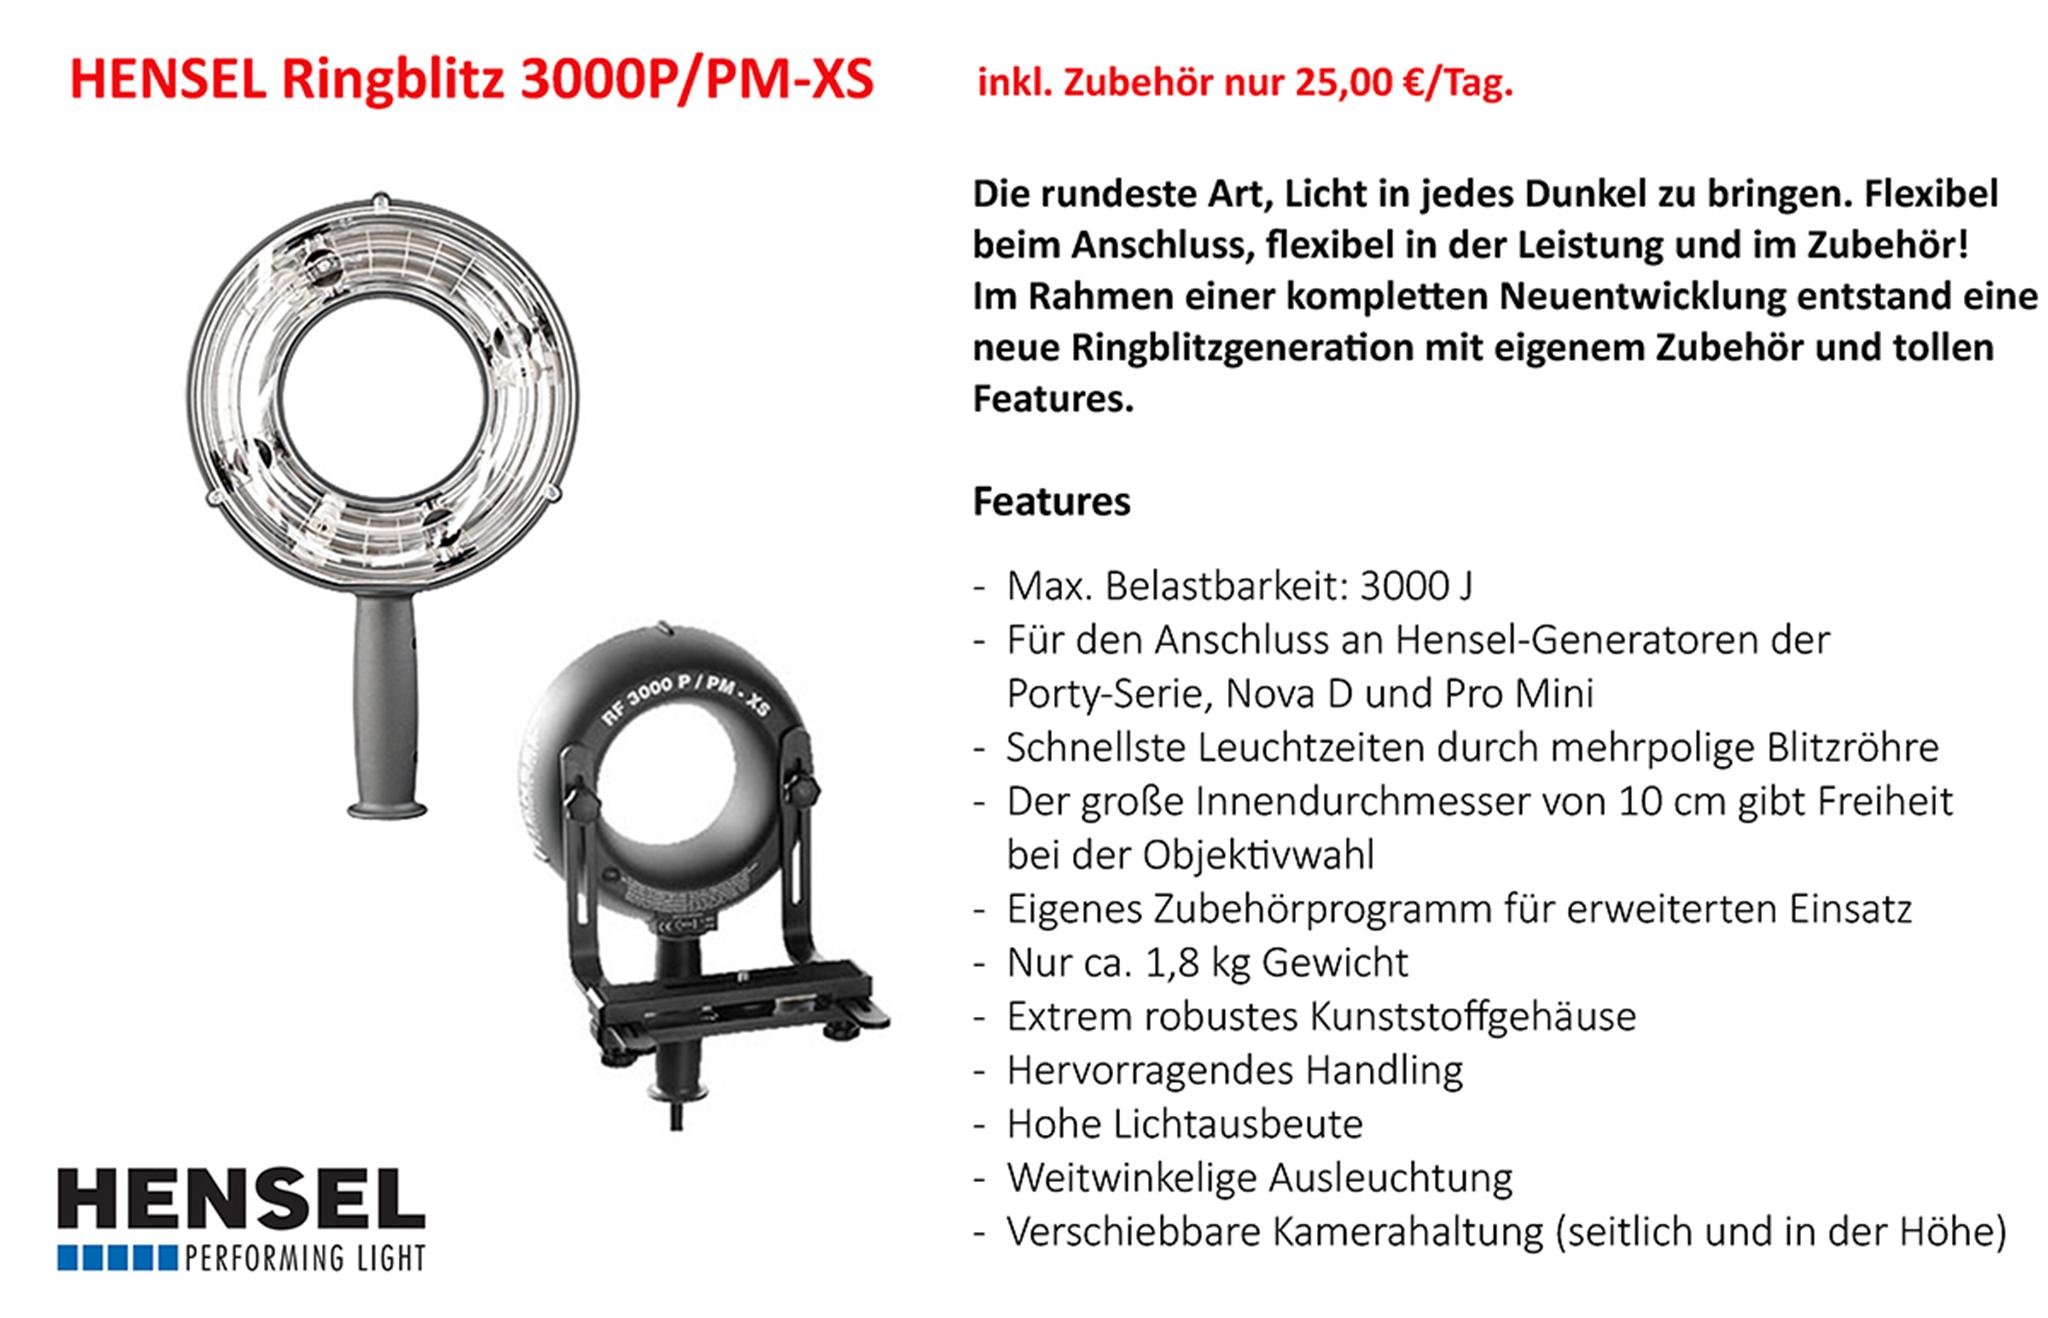 Hensel Ringblitz 3000P/PM-XS